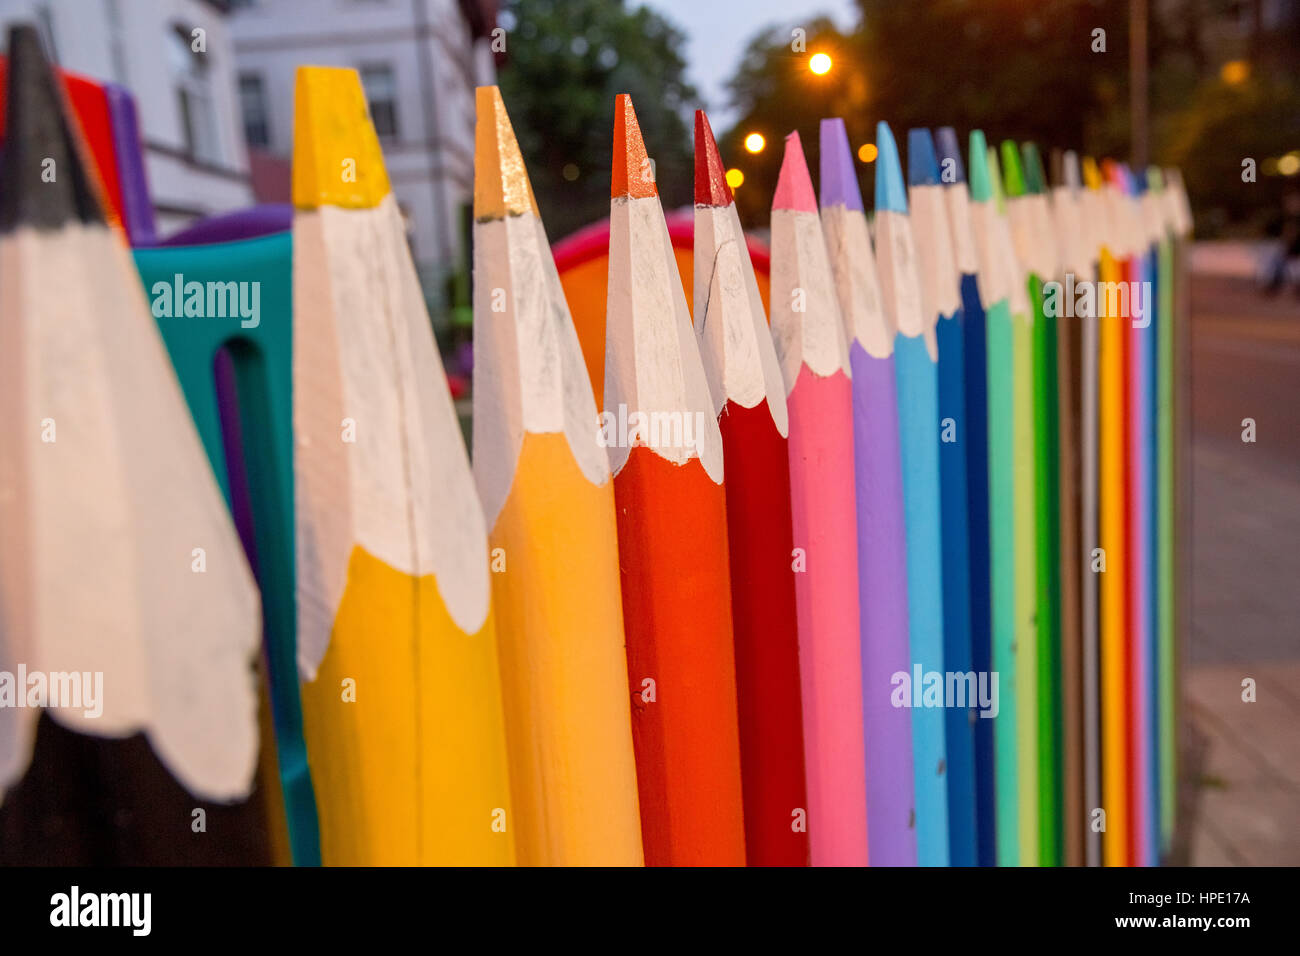 Charmant Druckbare Buntstifte Fotos - Framing Malvorlagen ...